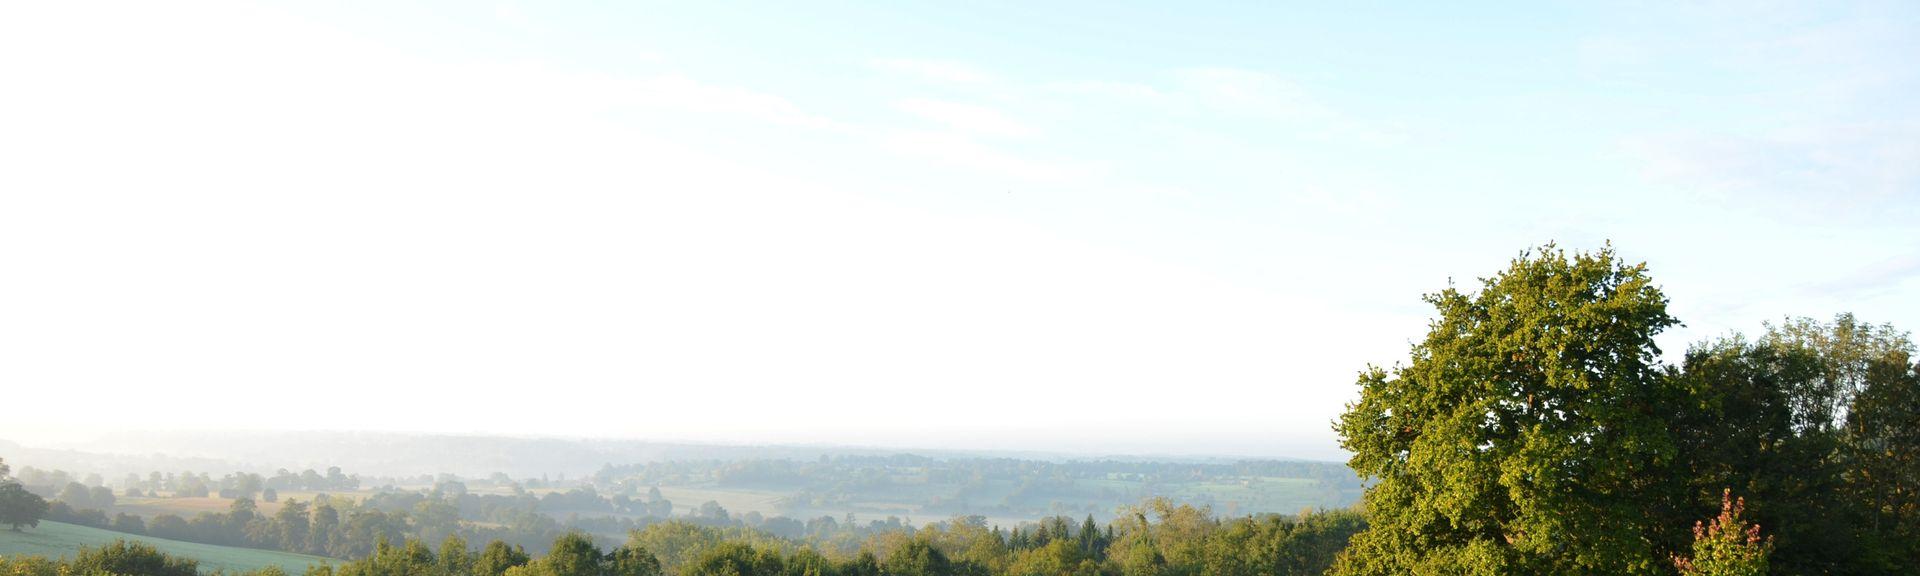 Honfleur, Calvados (departement), Frankrijk